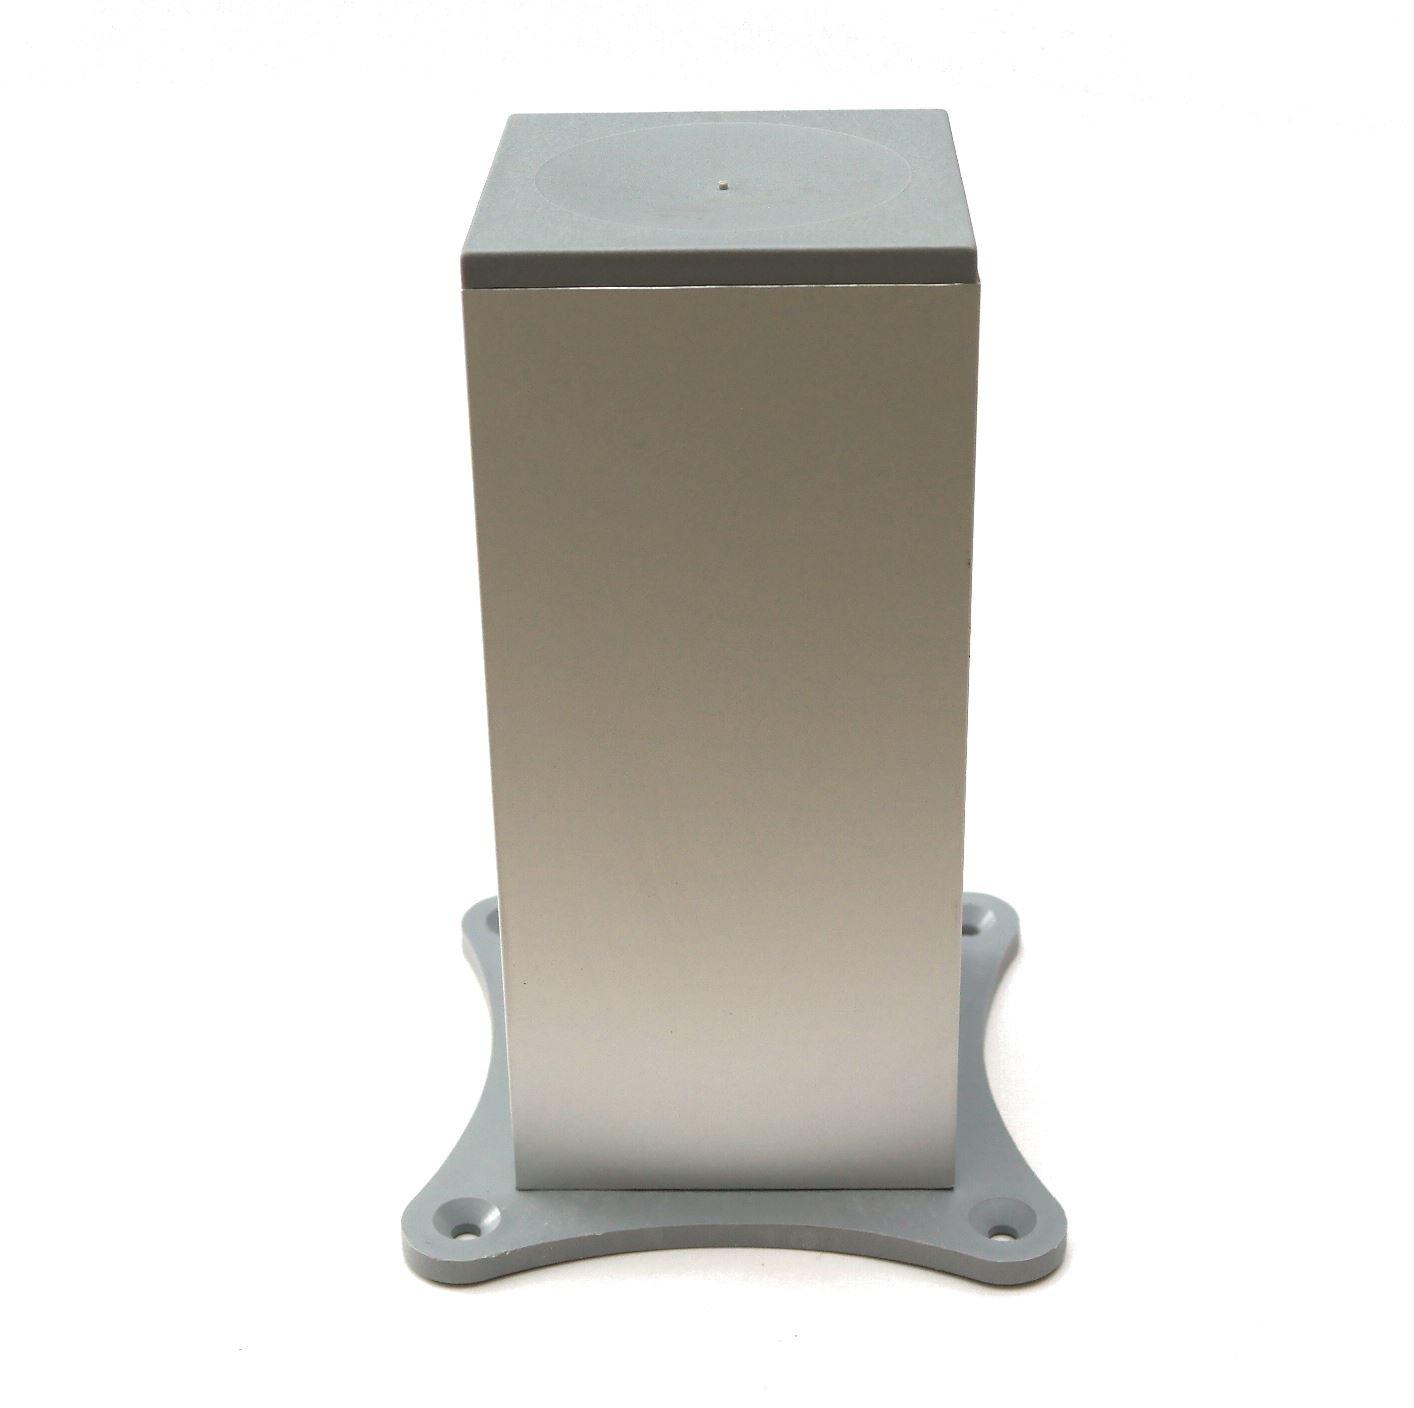 aluminium f e beine schr nke k che m bel chrom 70mm. Black Bedroom Furniture Sets. Home Design Ideas